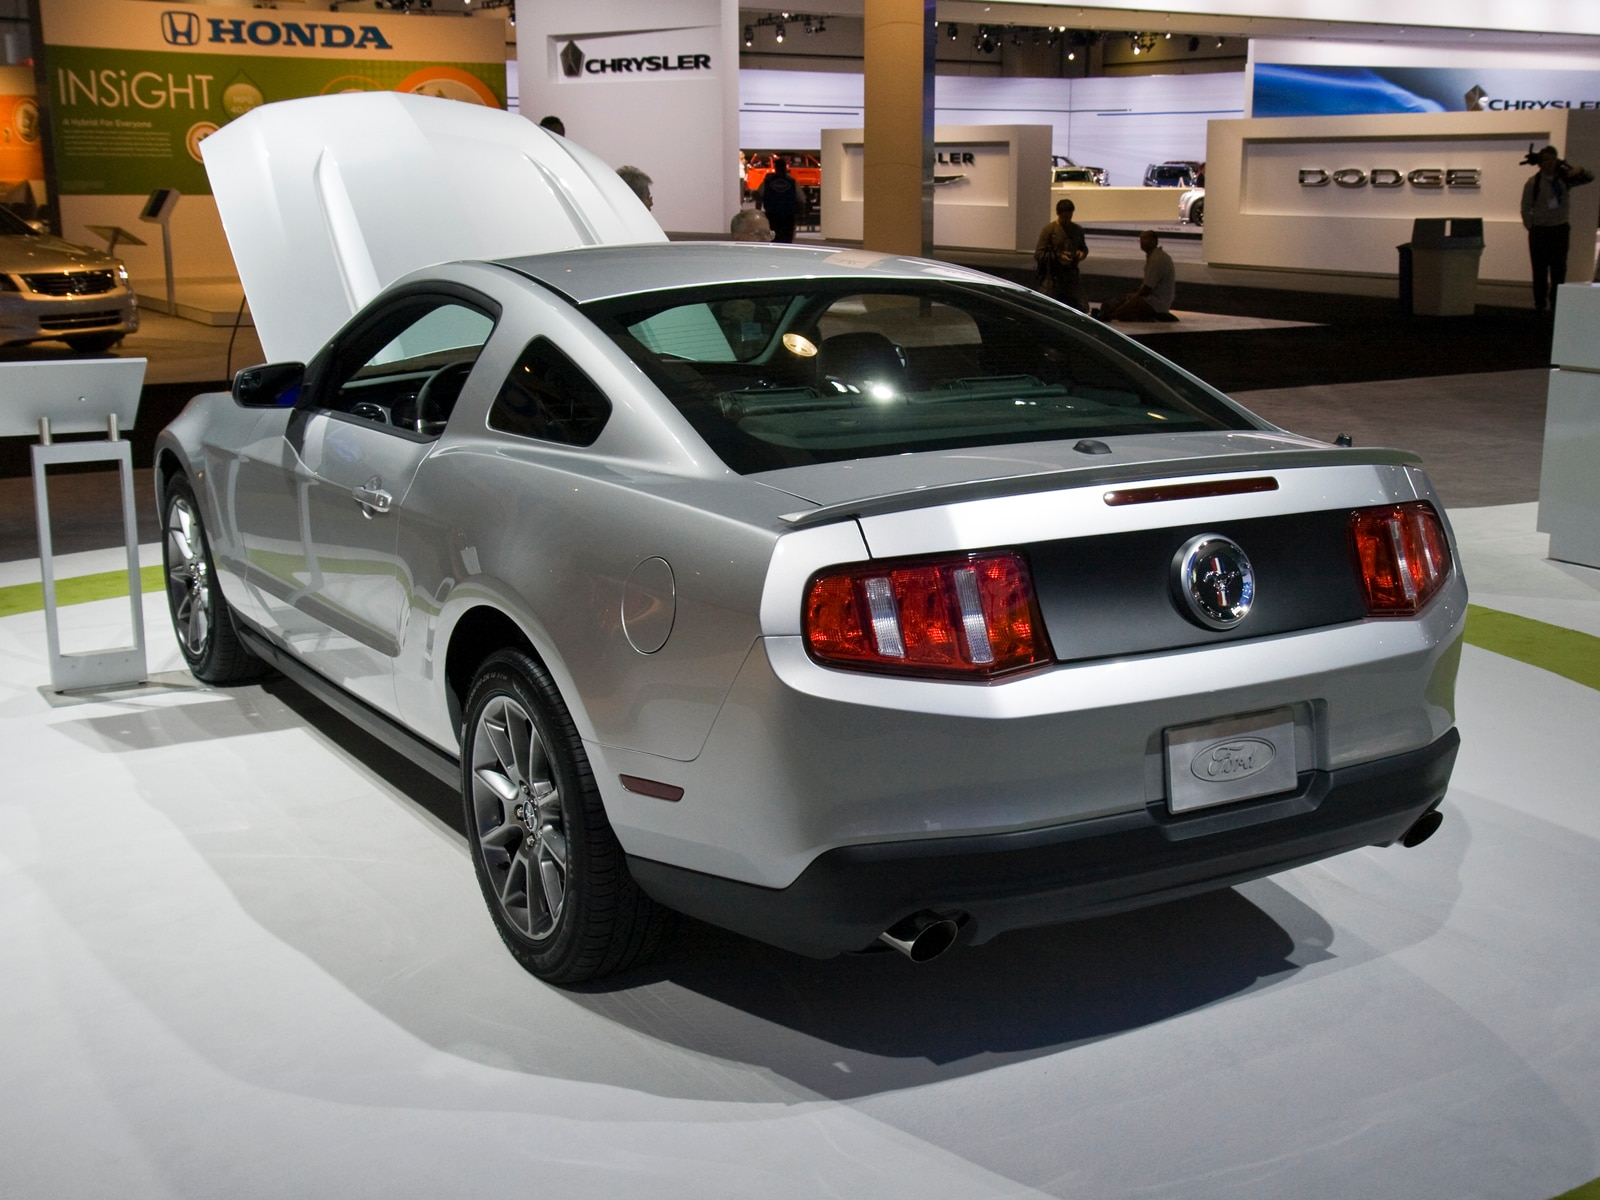 0912 05 Z 2011 Ford Mustang V6 Rear Three Quarters View